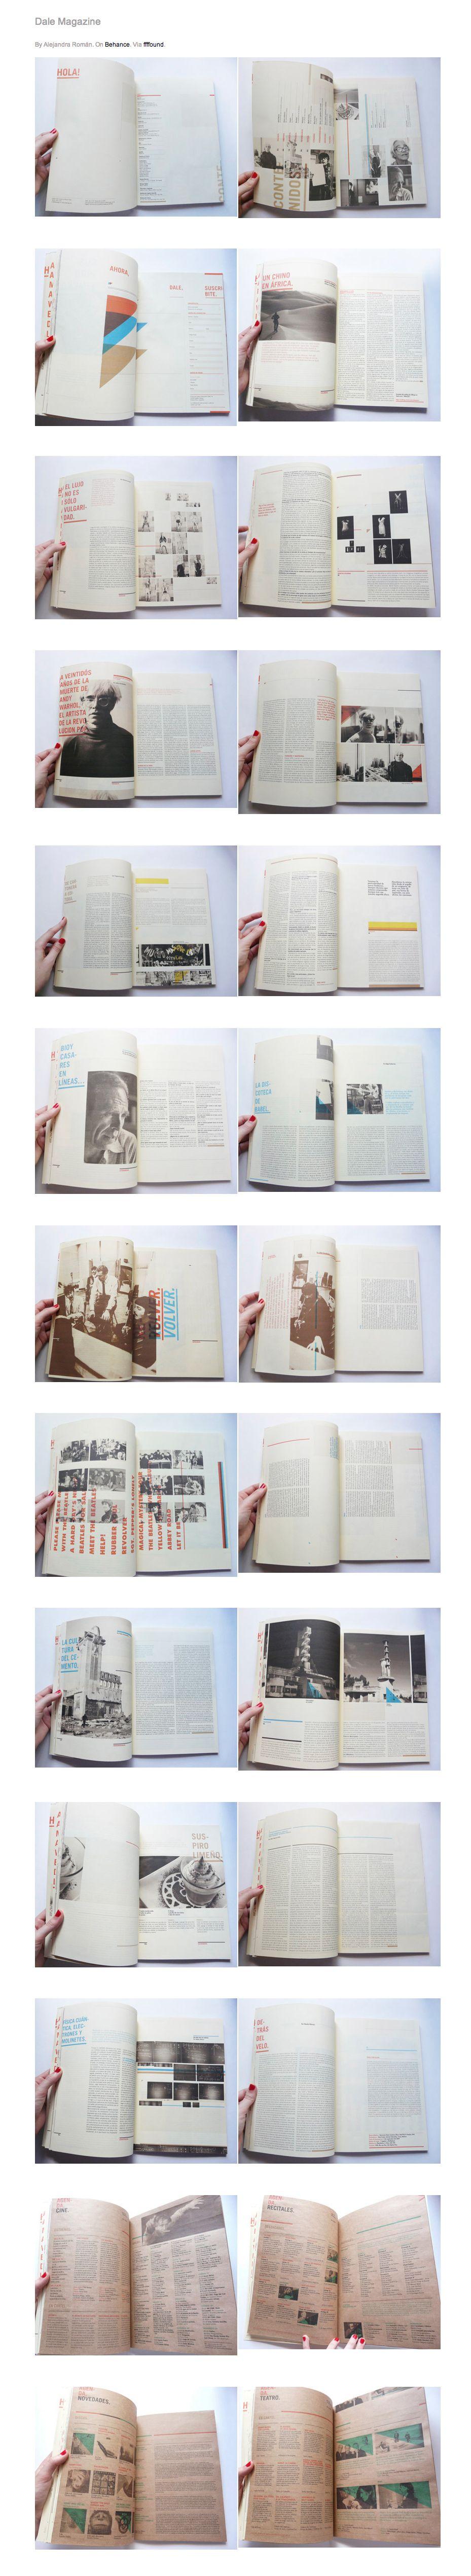 Dale Magazine | Gridness #magazine #editorial #design #graphic #design #pikock www.pikock.com #inspiration #book